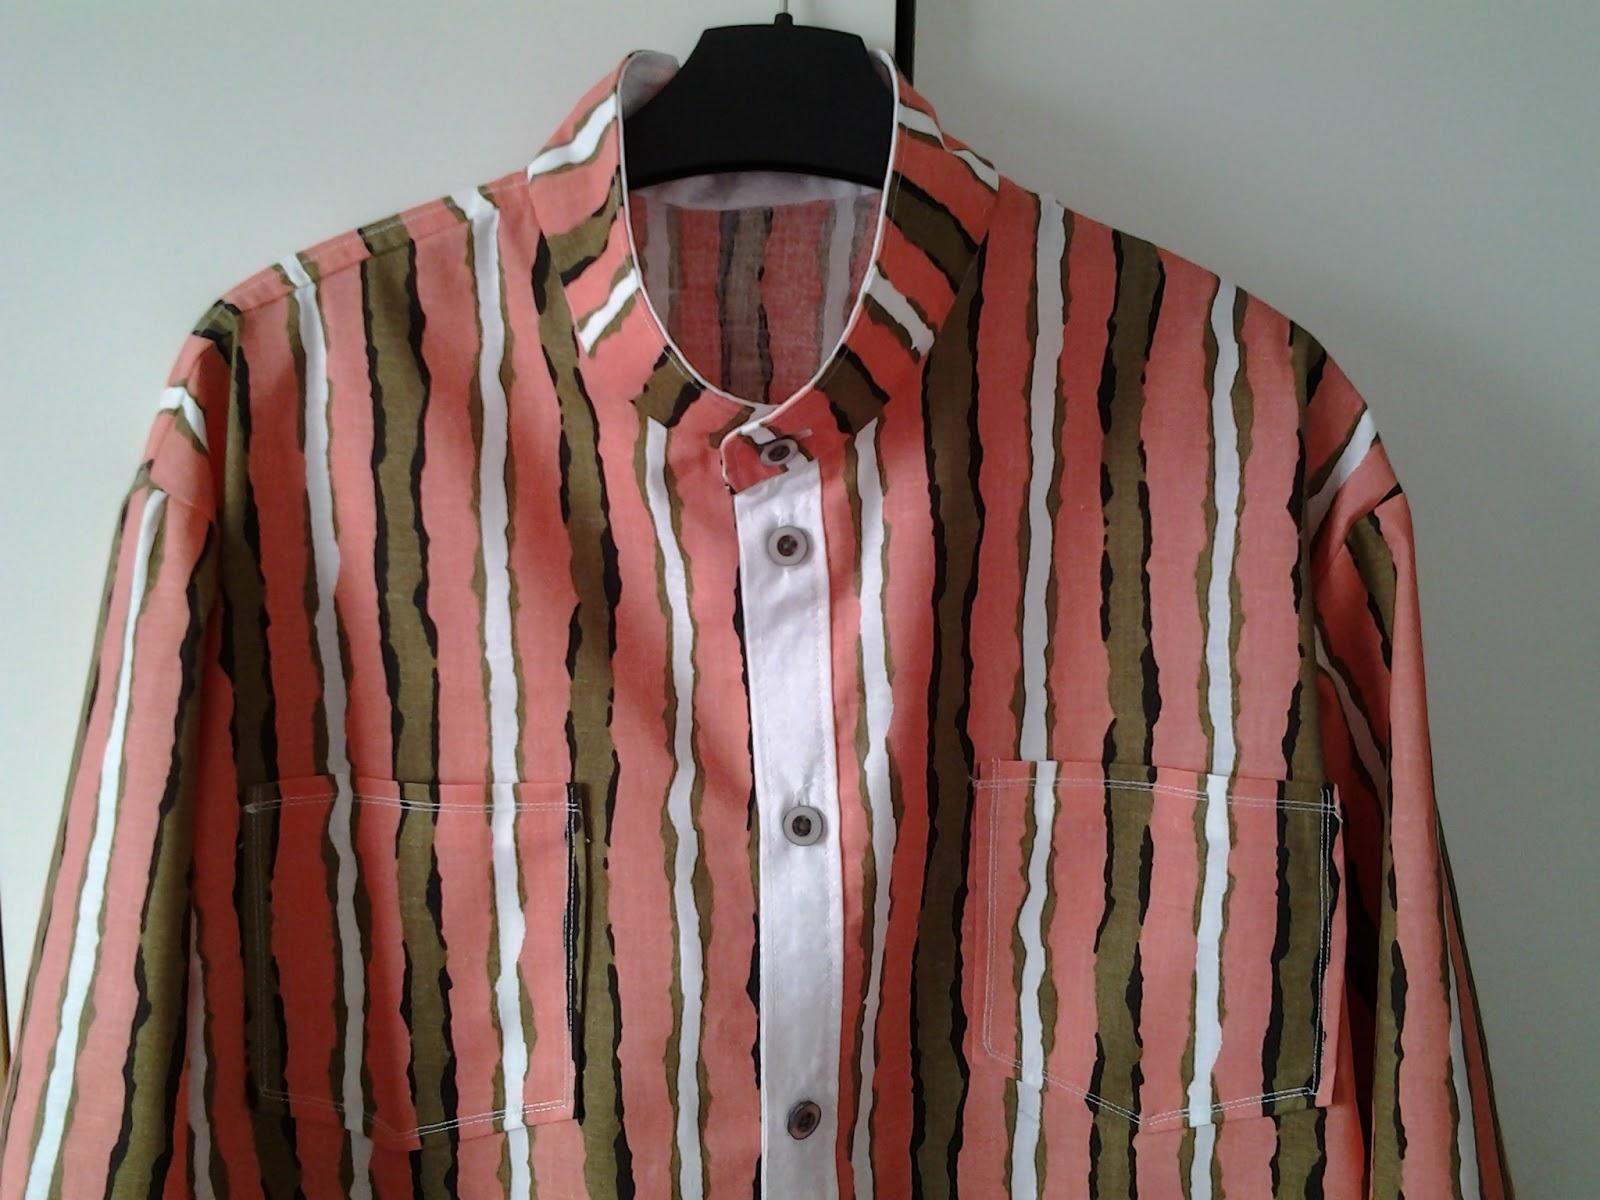 How to make a shirt 74